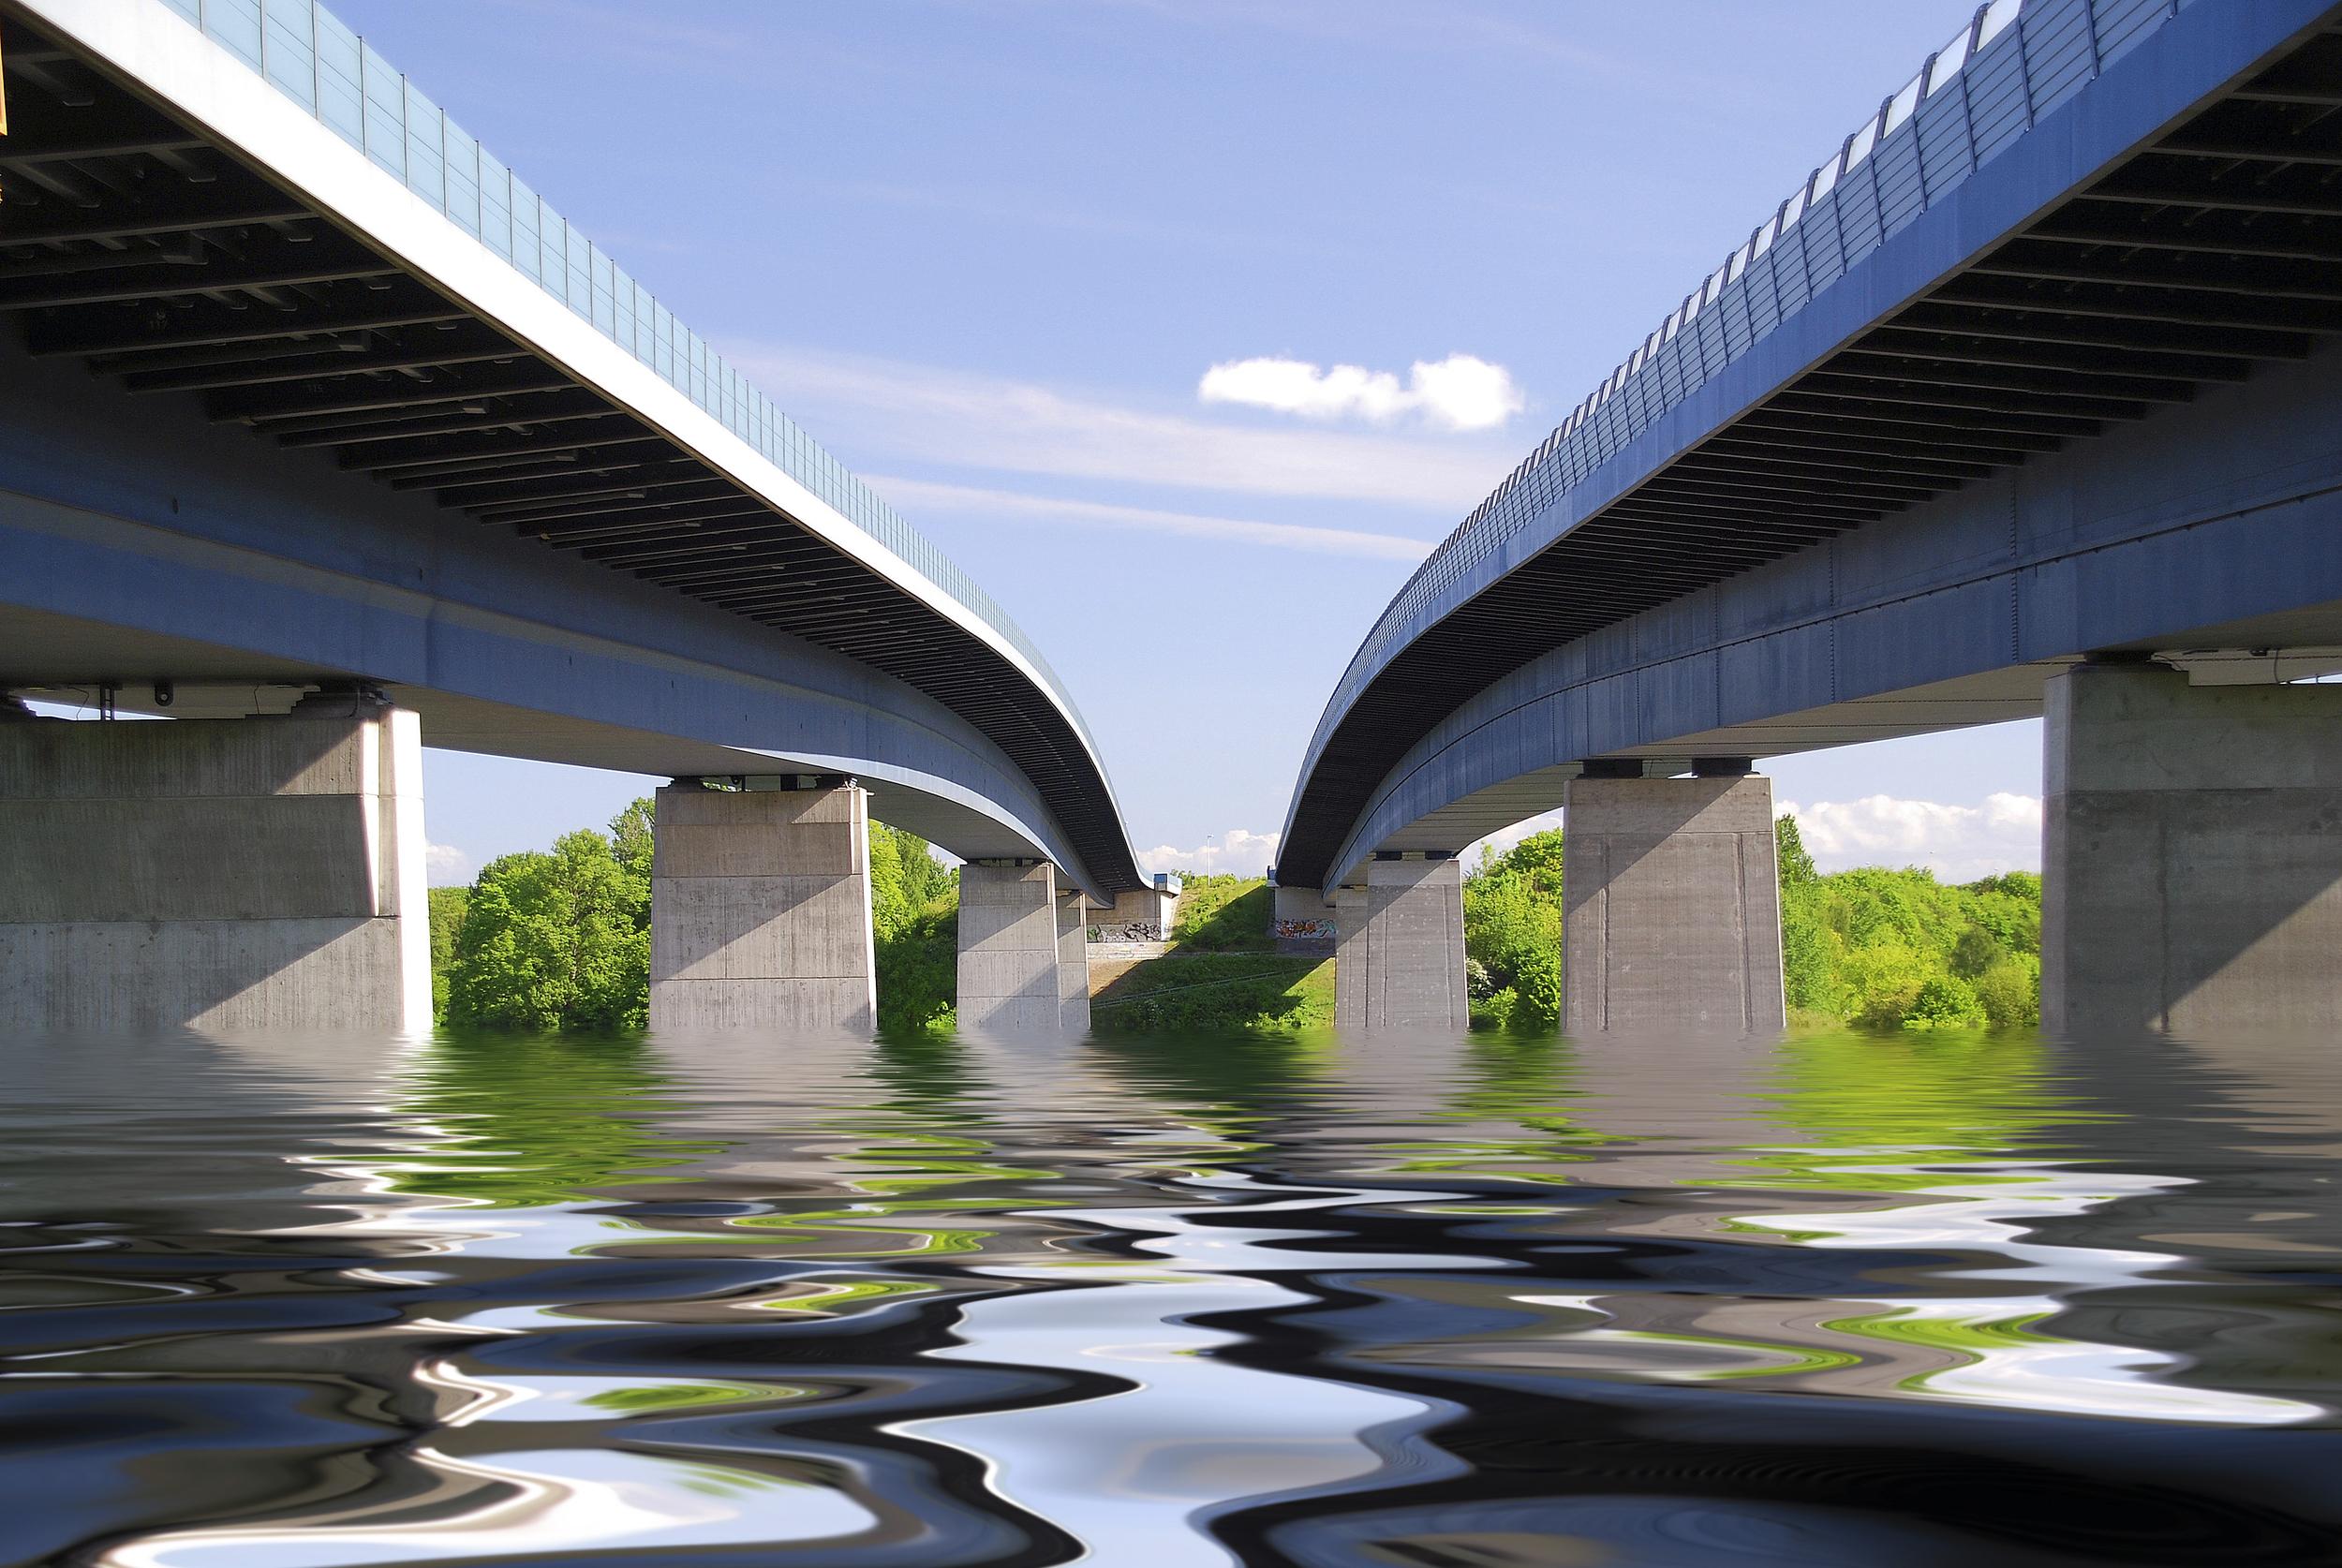 bridge_G17Ss7cu.jpg